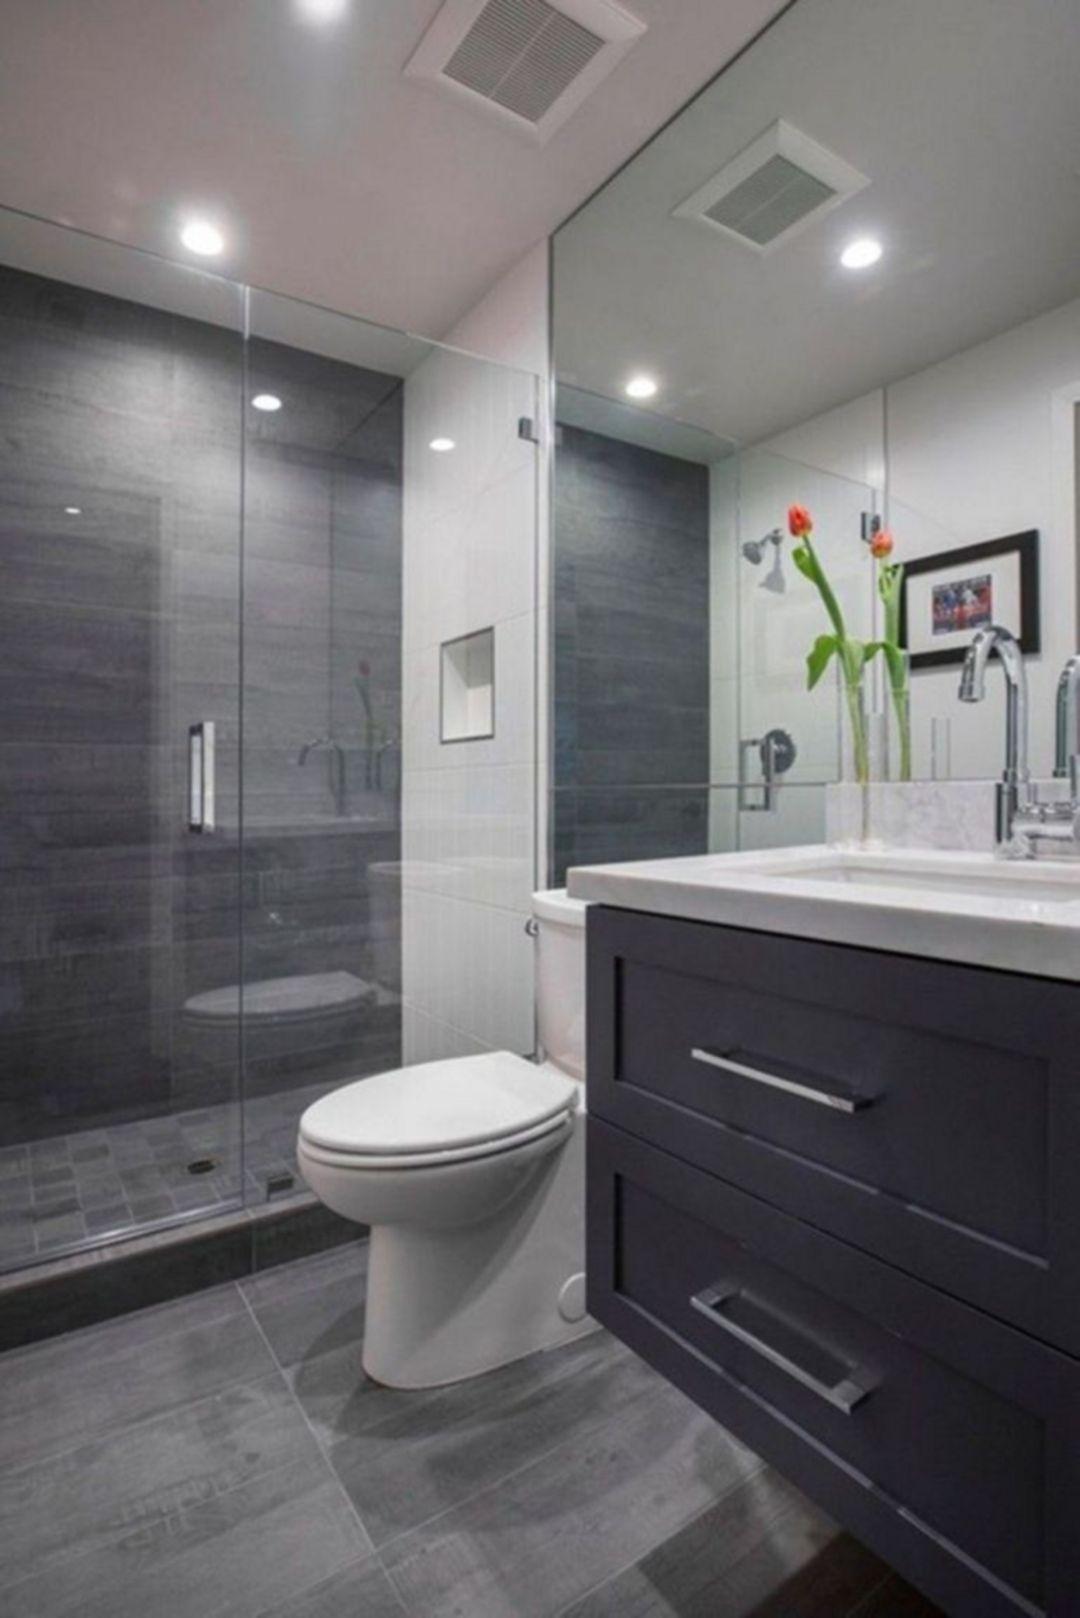 15 wonderful small bathroom remodeling design ideas to on bathroom renovation ideas for small bathrooms id=16939